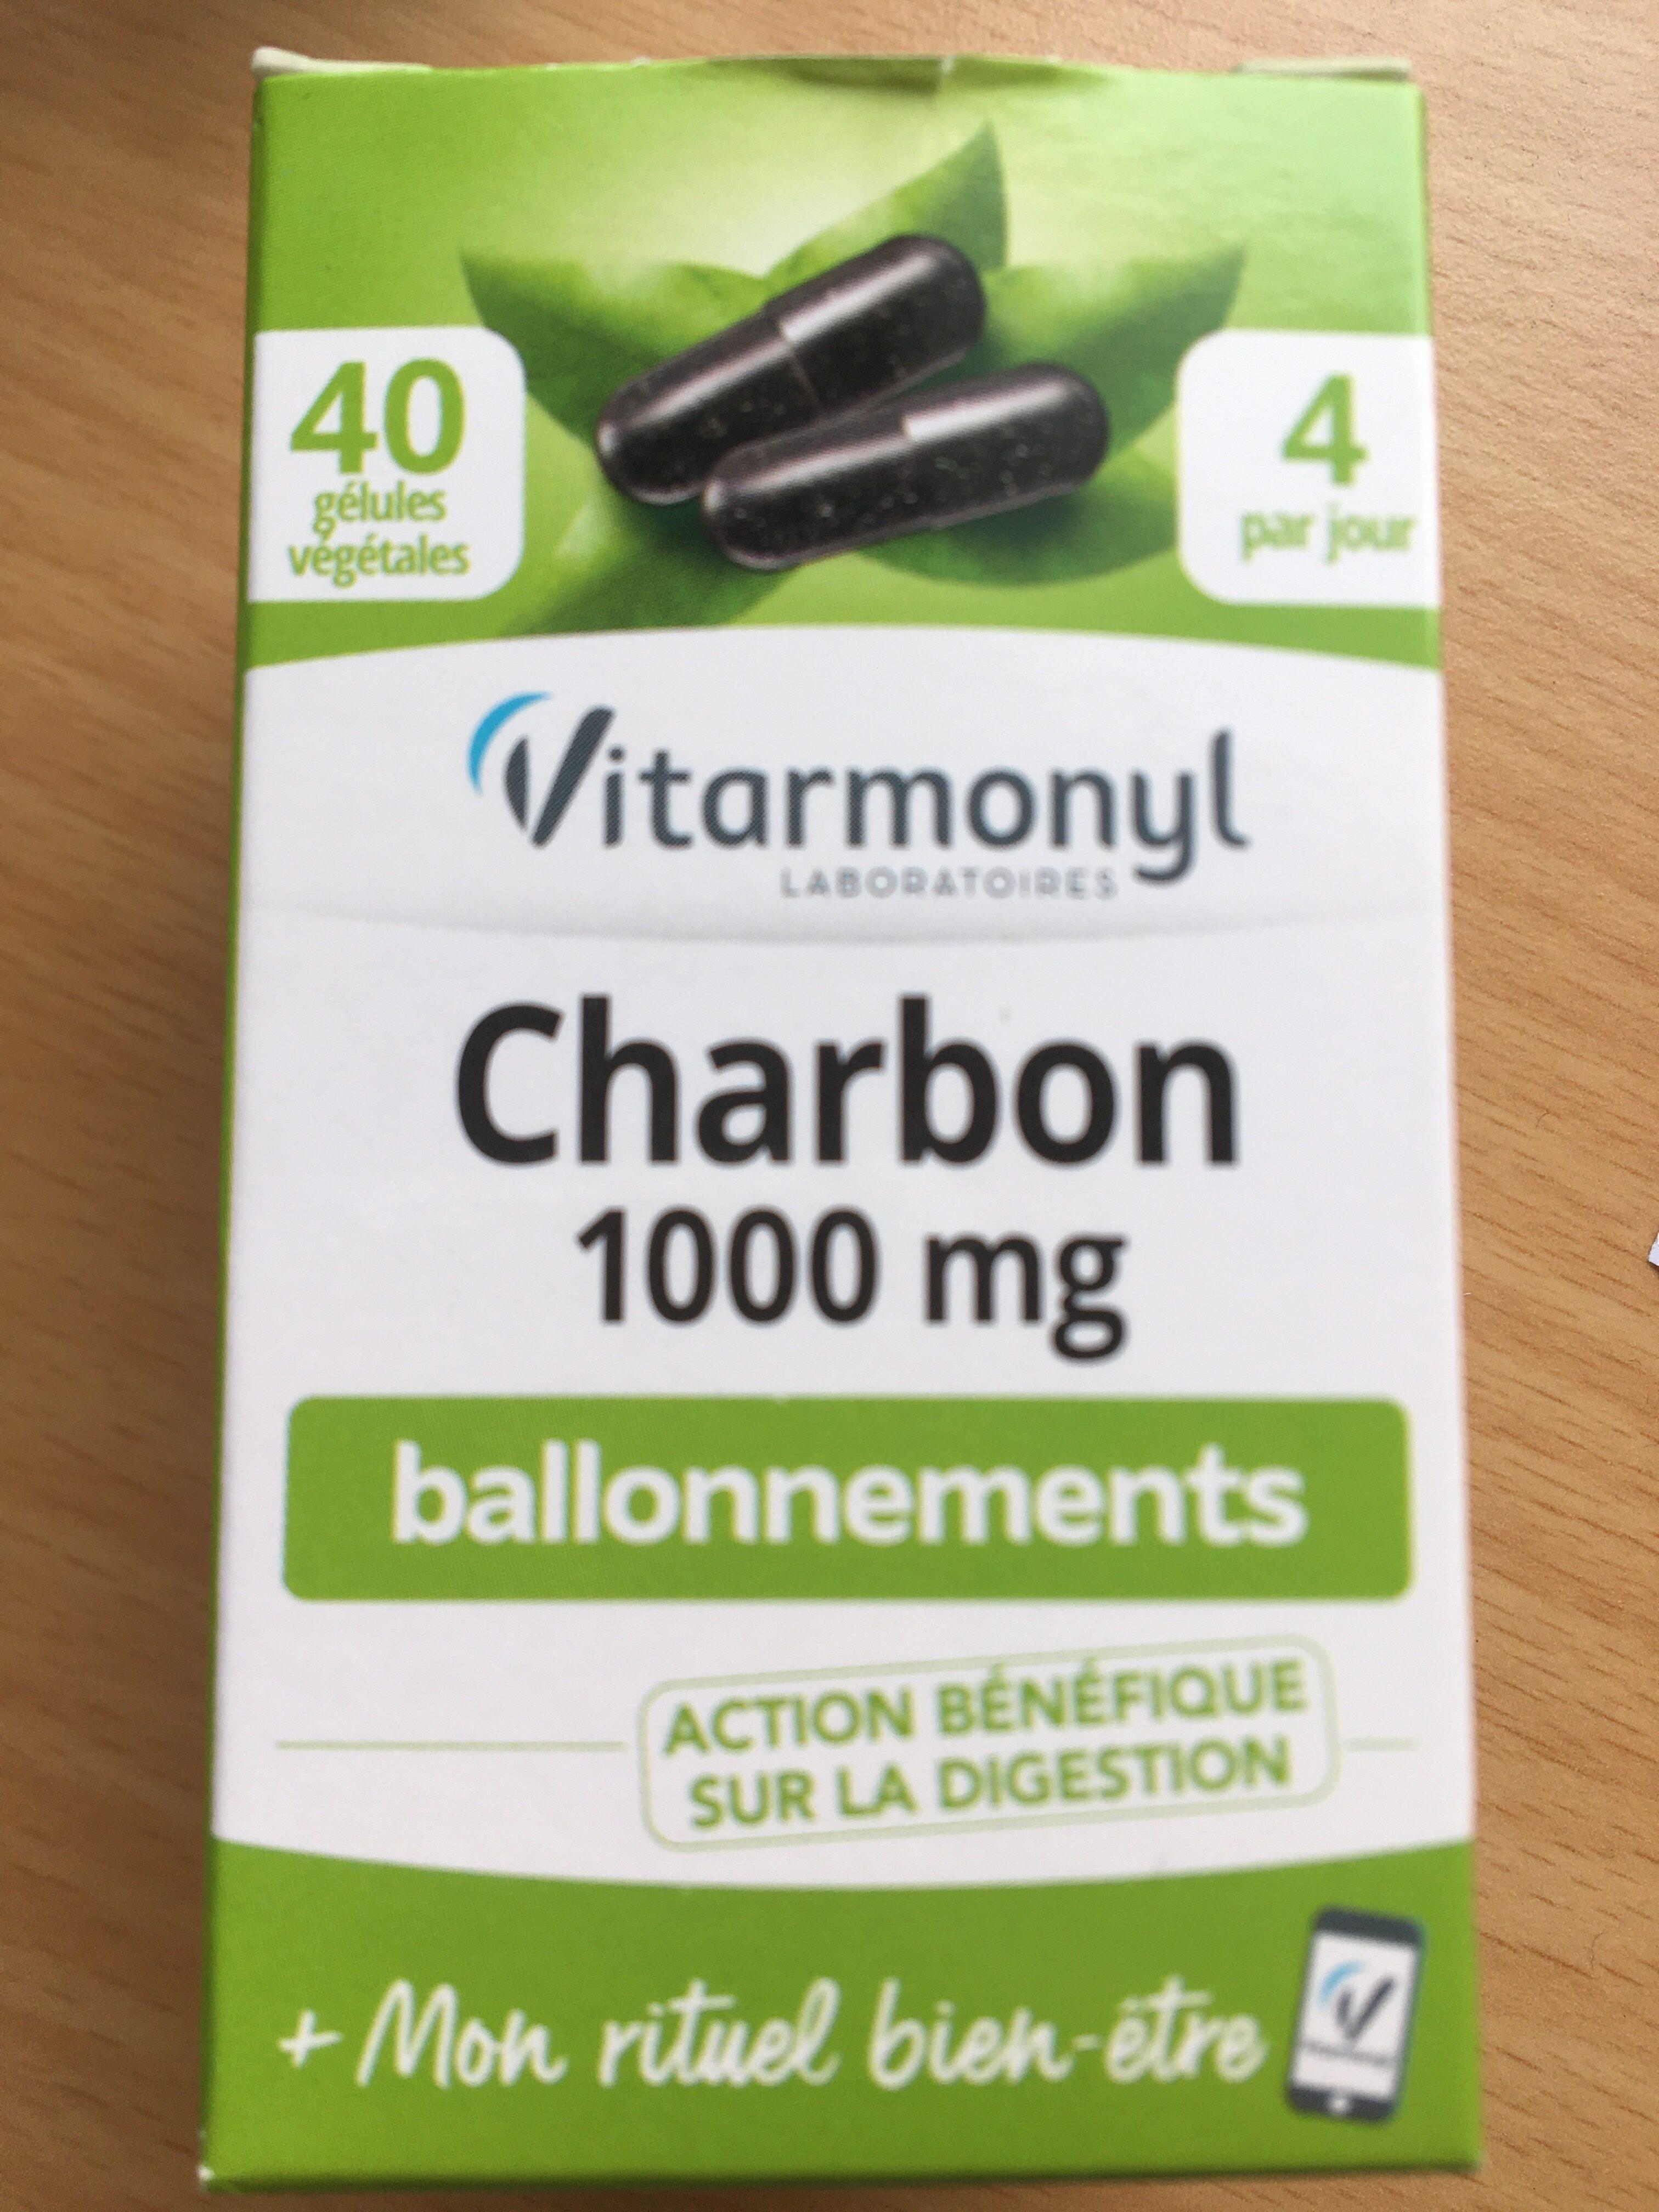 Charbon 1000 mg ballonnements - Produit - fr